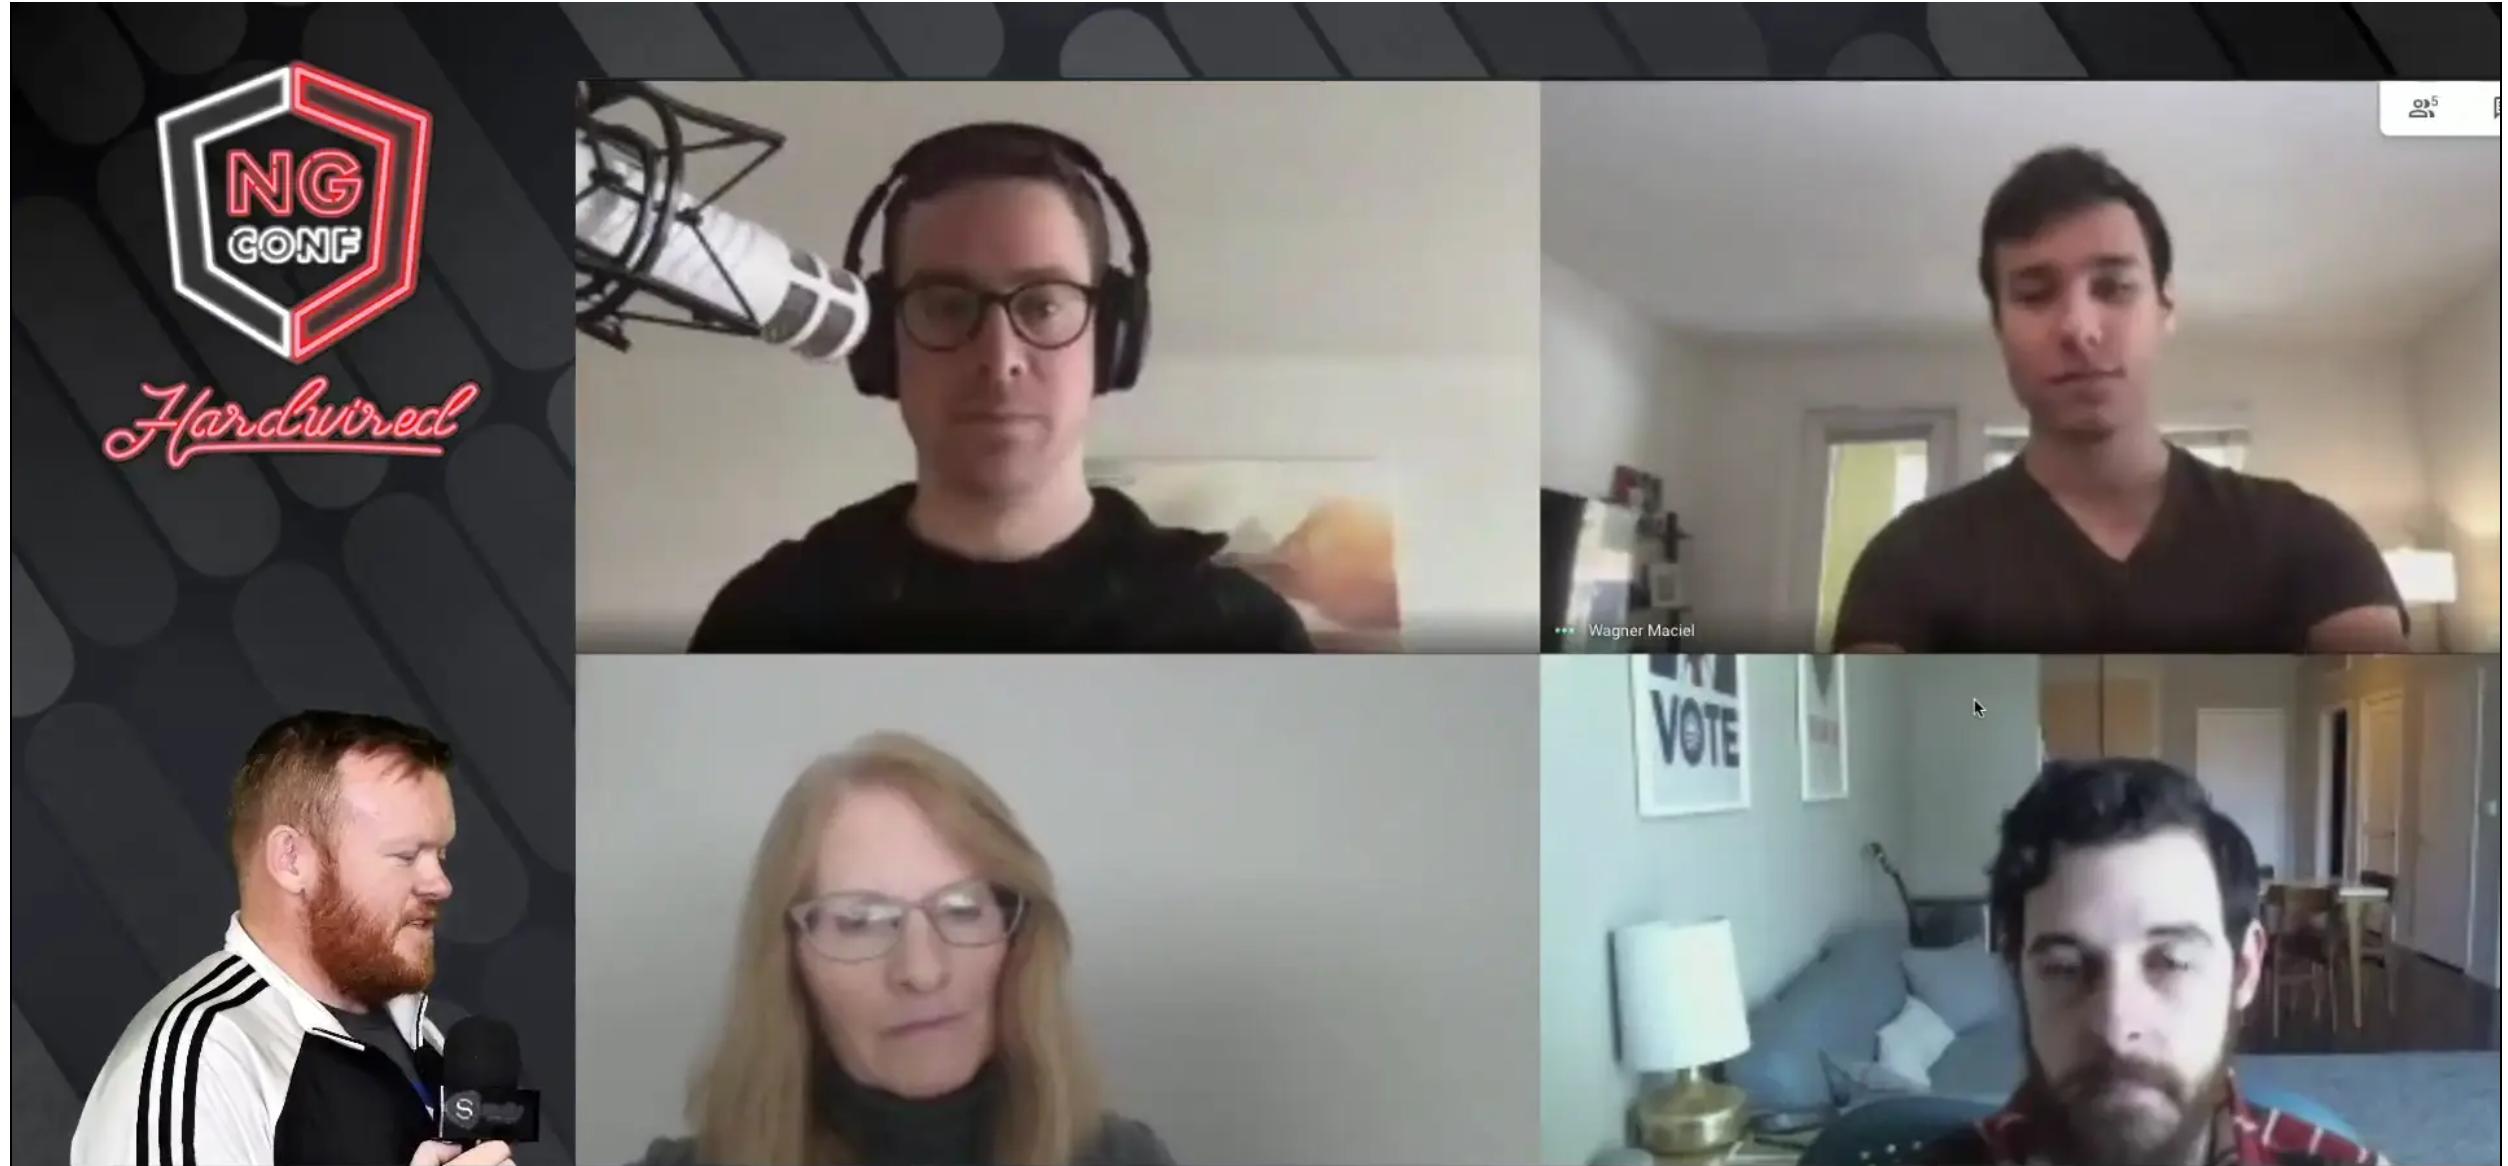 Q&A PANEL | Jeremy Elbourn | Wagner Maciel | Deborah Kurata | Brian Love